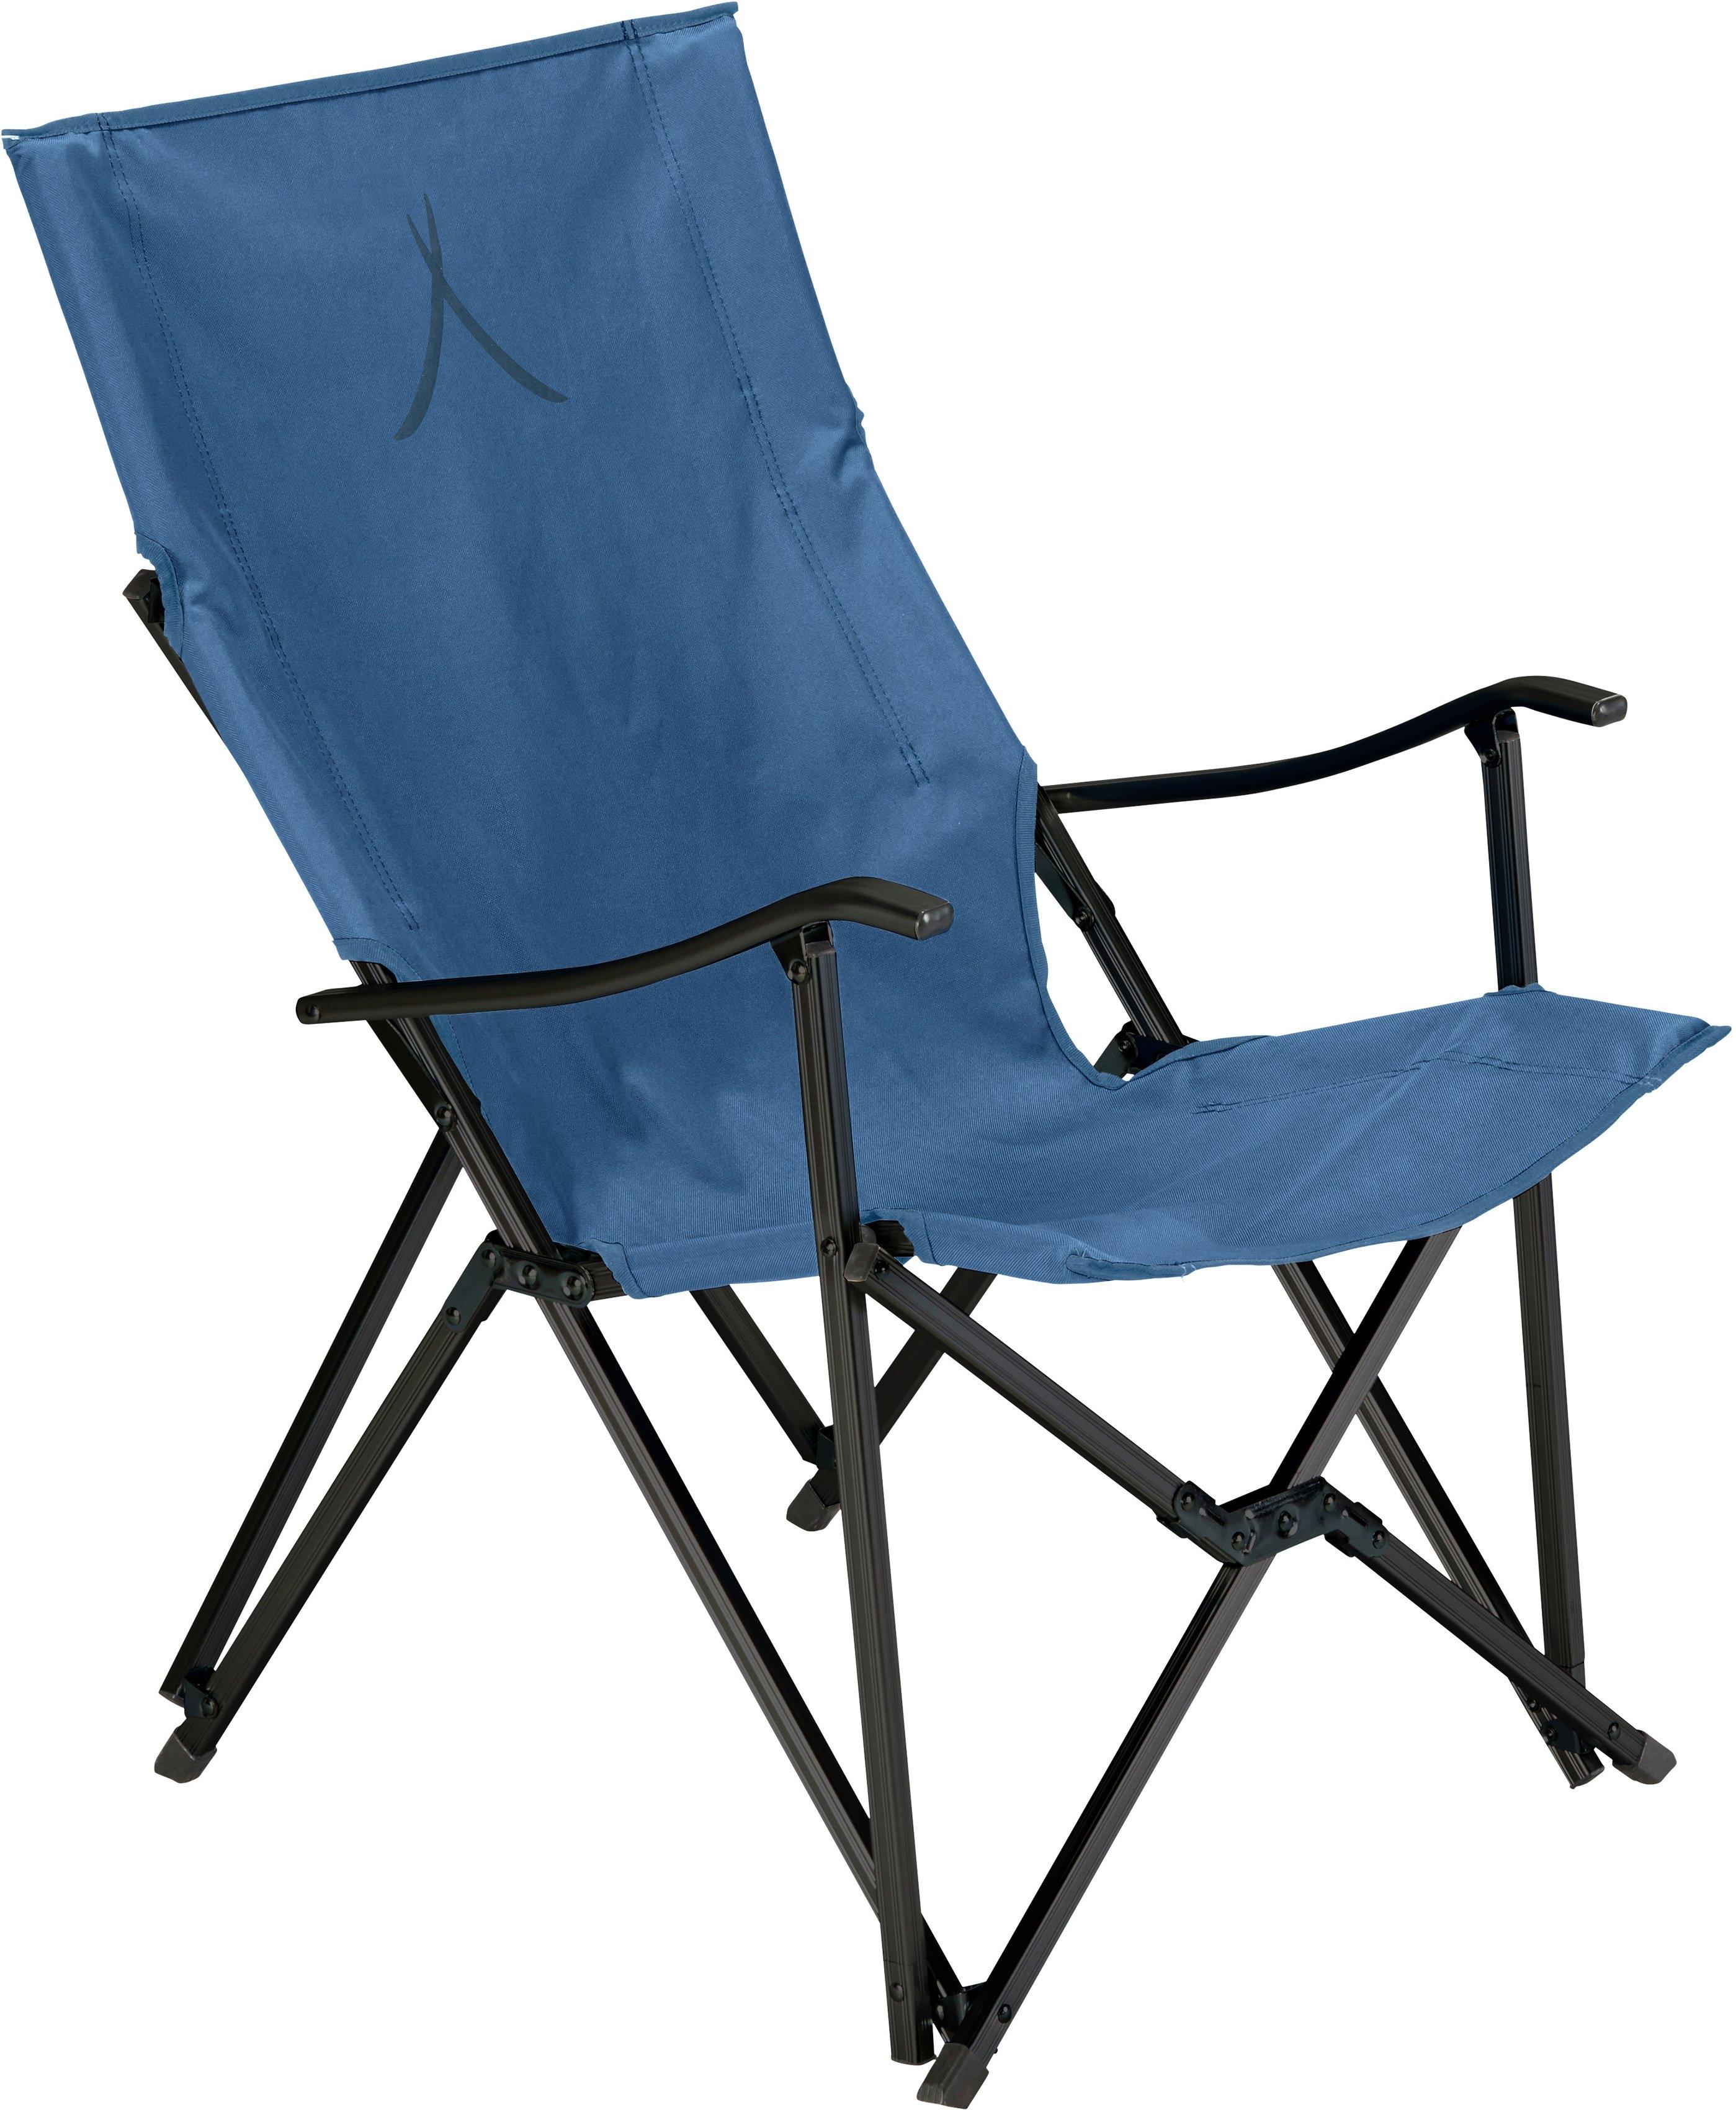 GRAND CANYON campingstoel EL TOVAR (1 stuk) online kopen op otto.nl